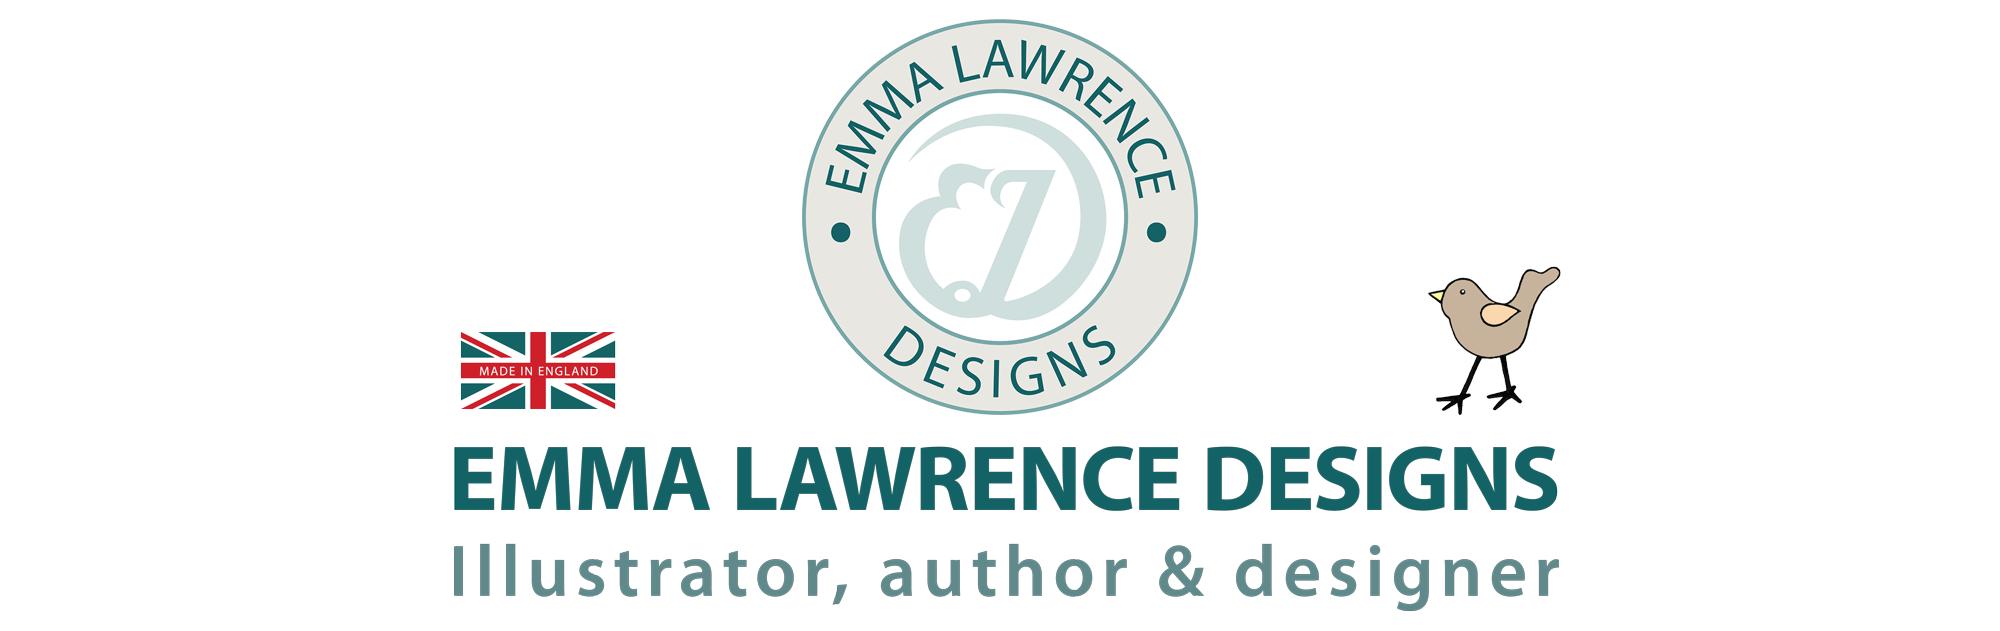 Emma Lawrence Designs Shropshire Illustrator